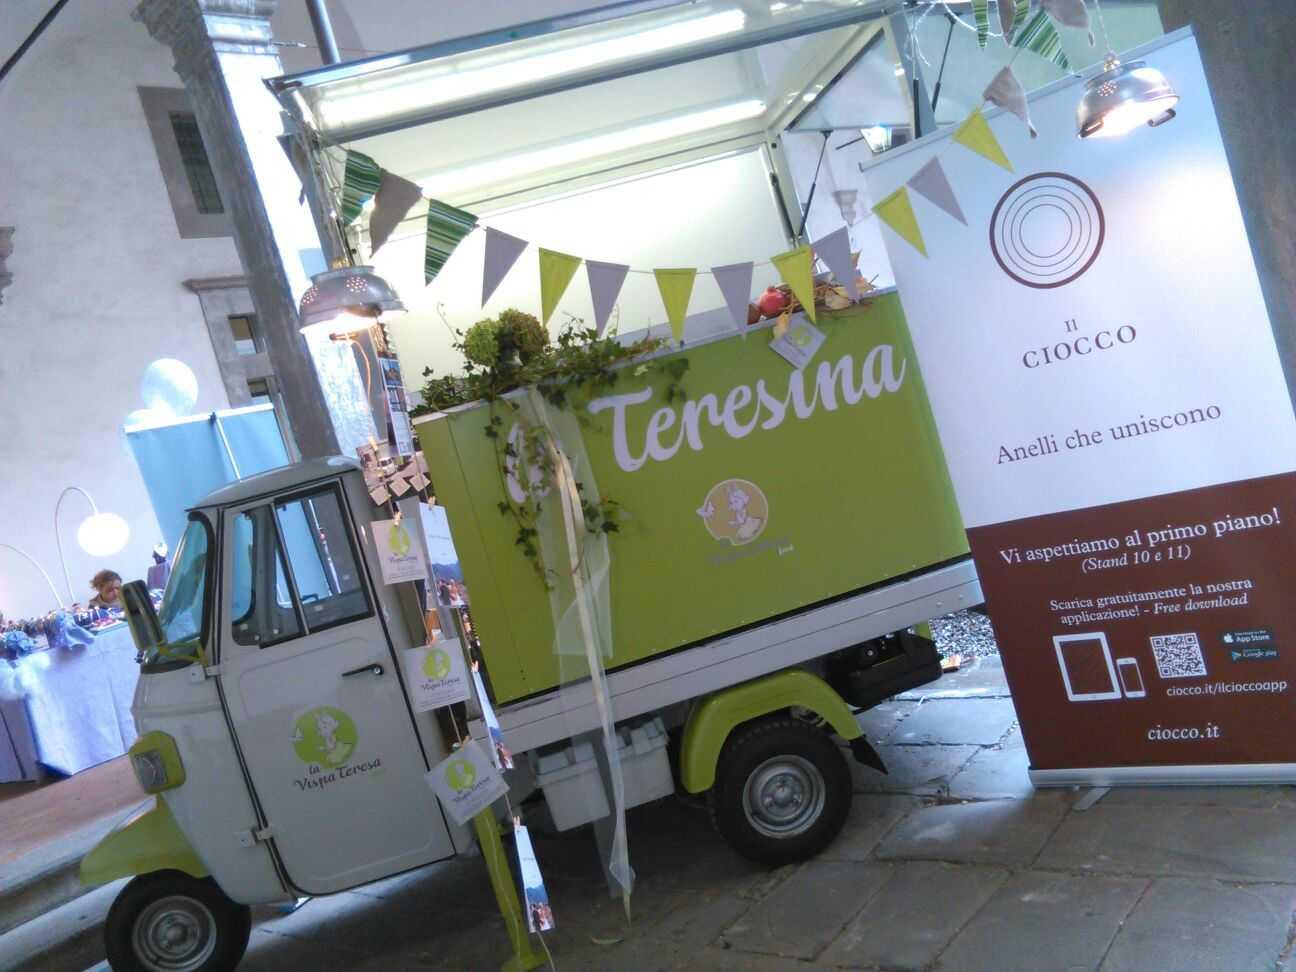 La vispa Teresa store&food